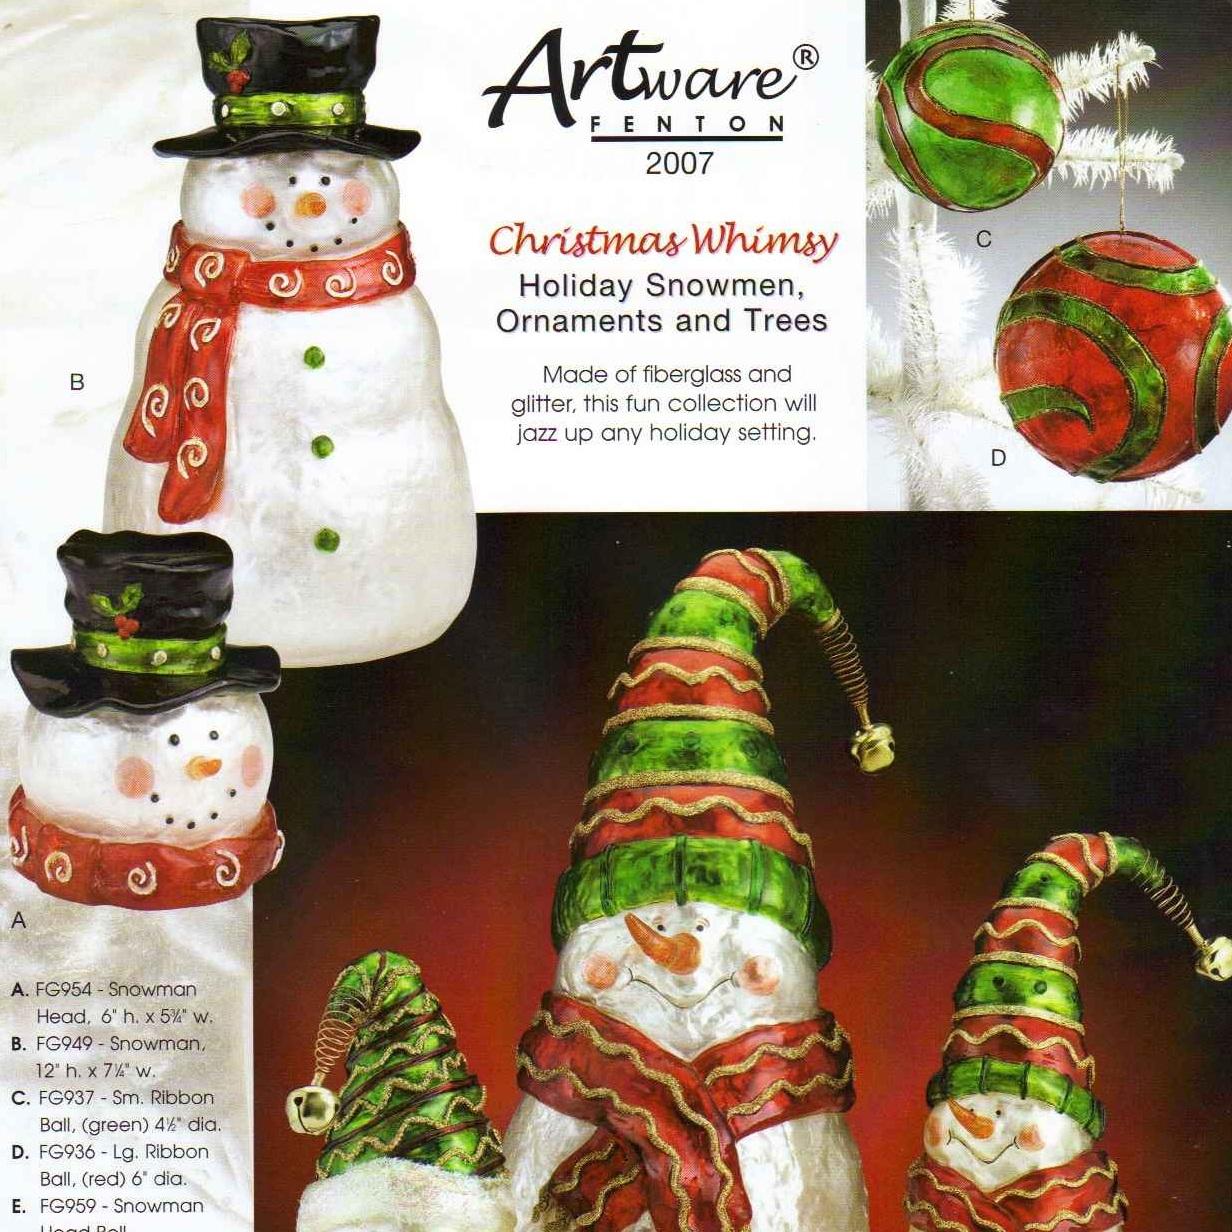 2007 Artware Christmas